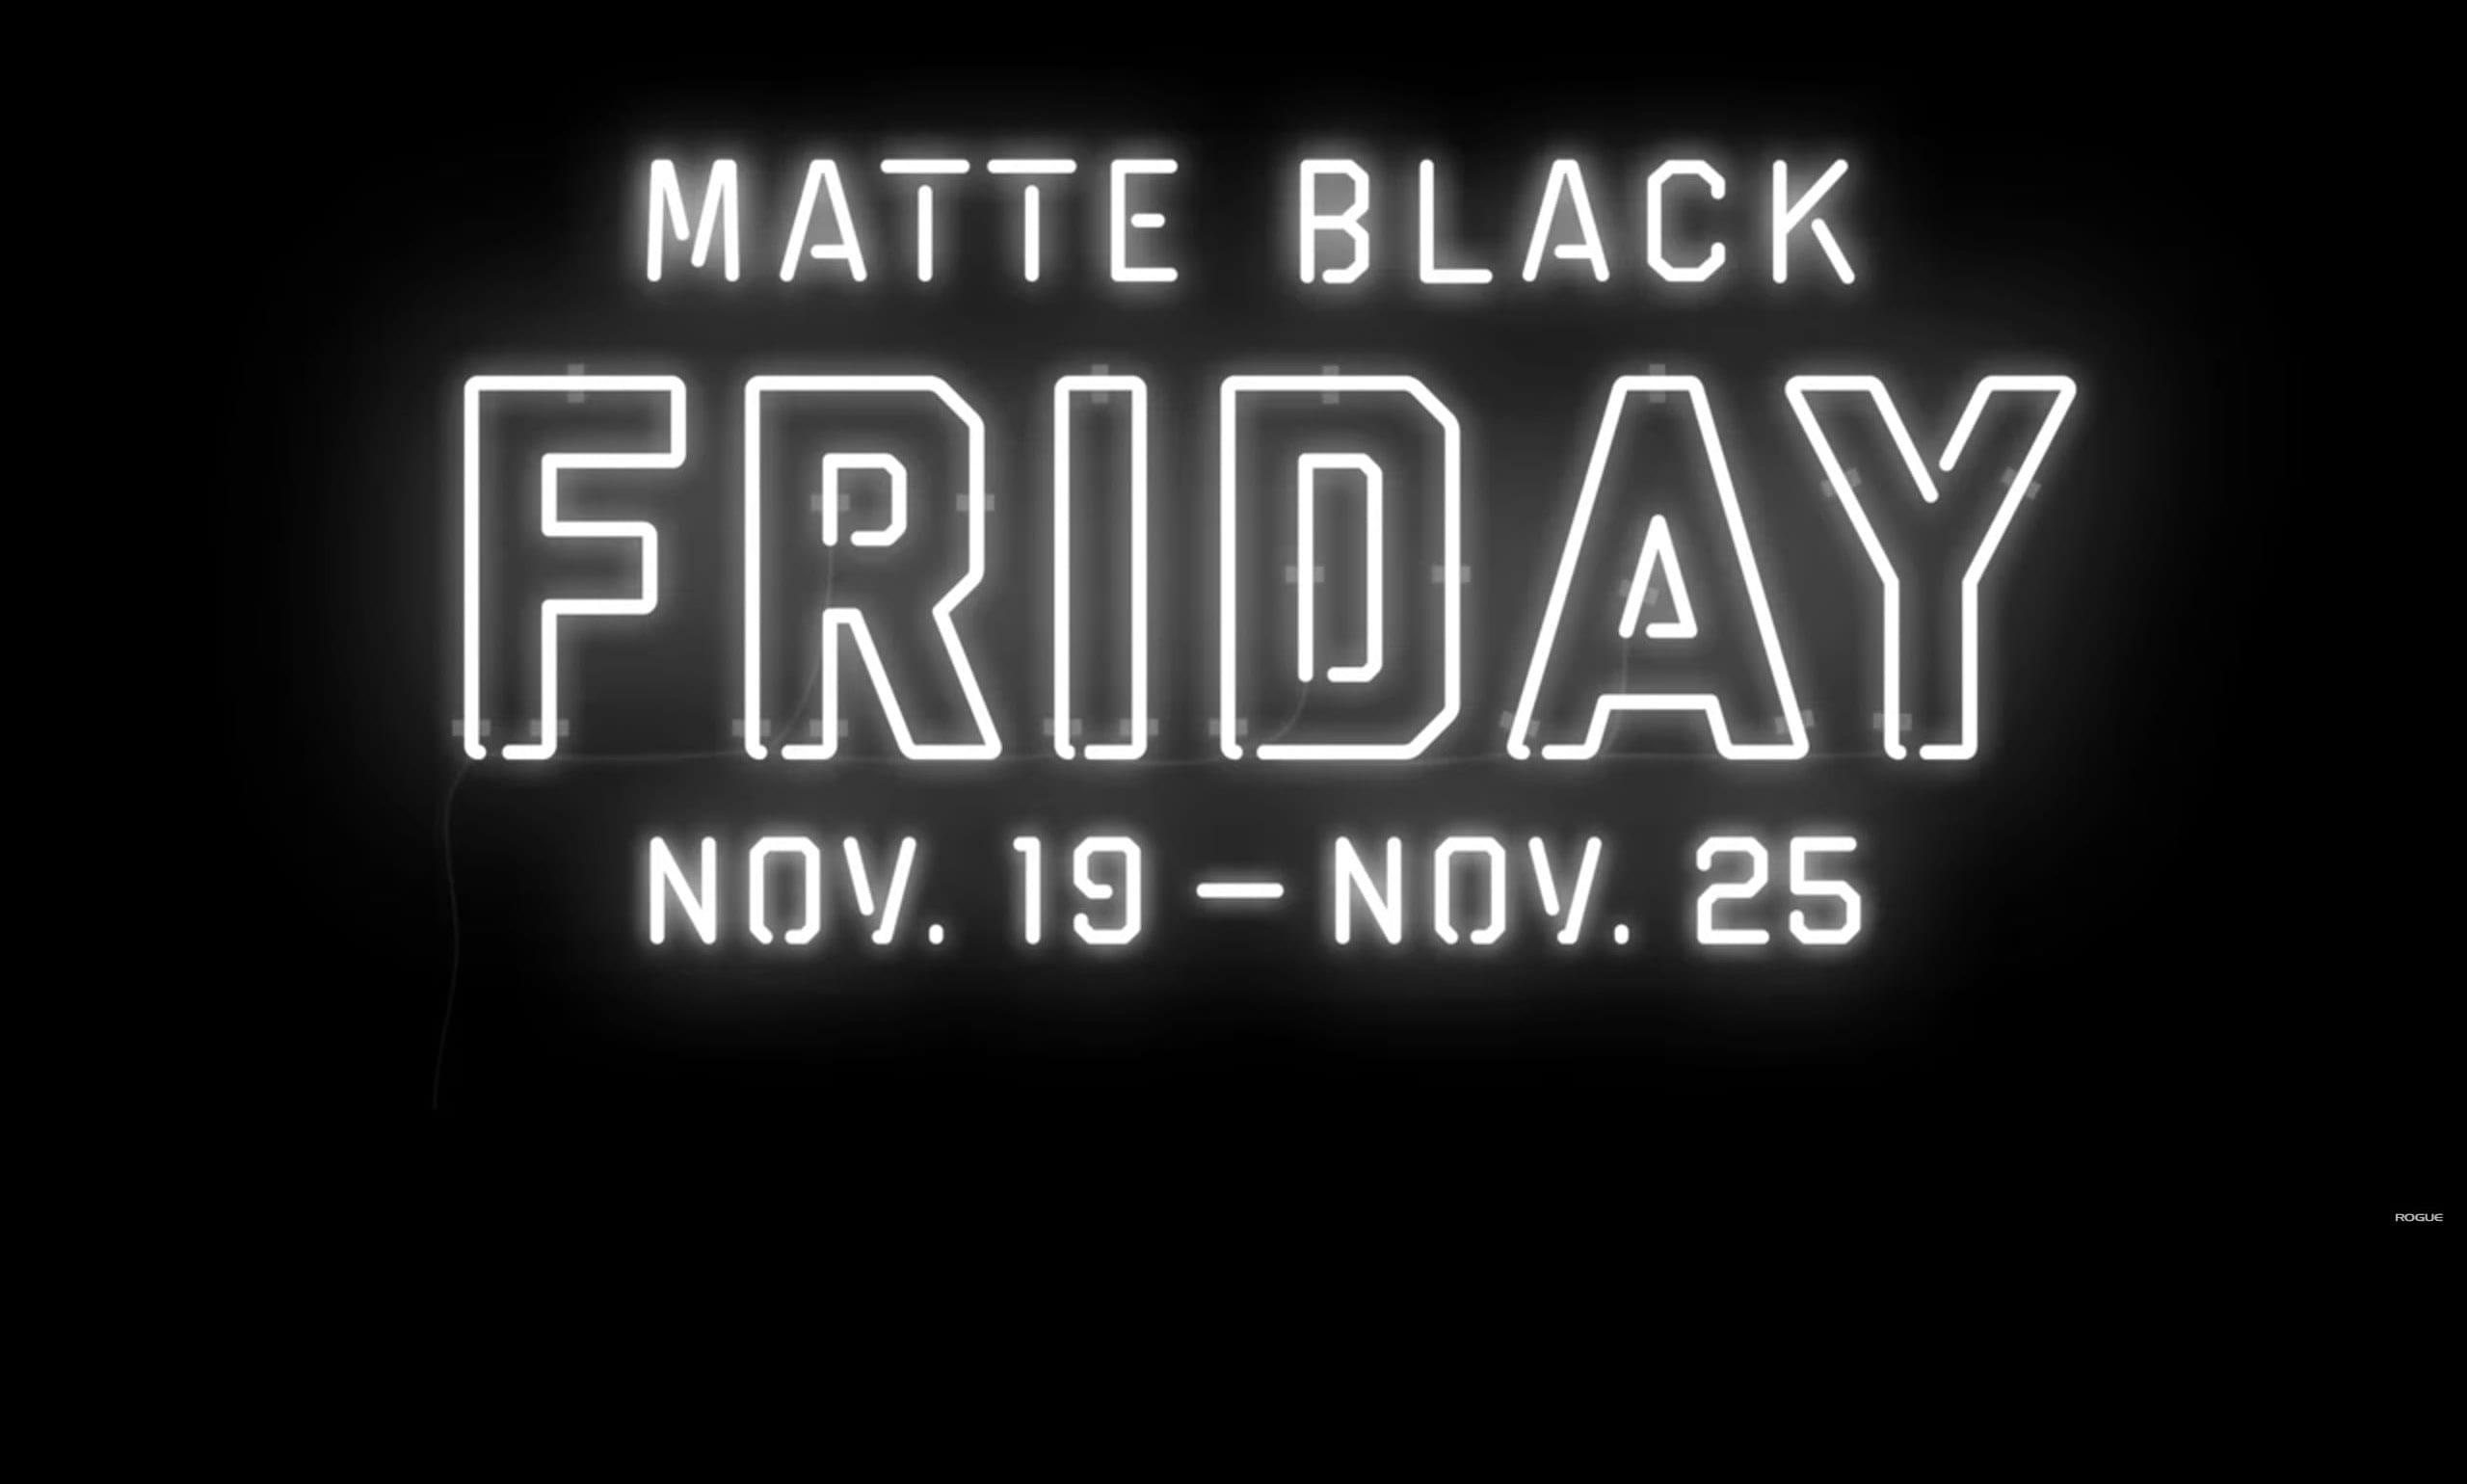 Matte Black Friday 2018 The Index